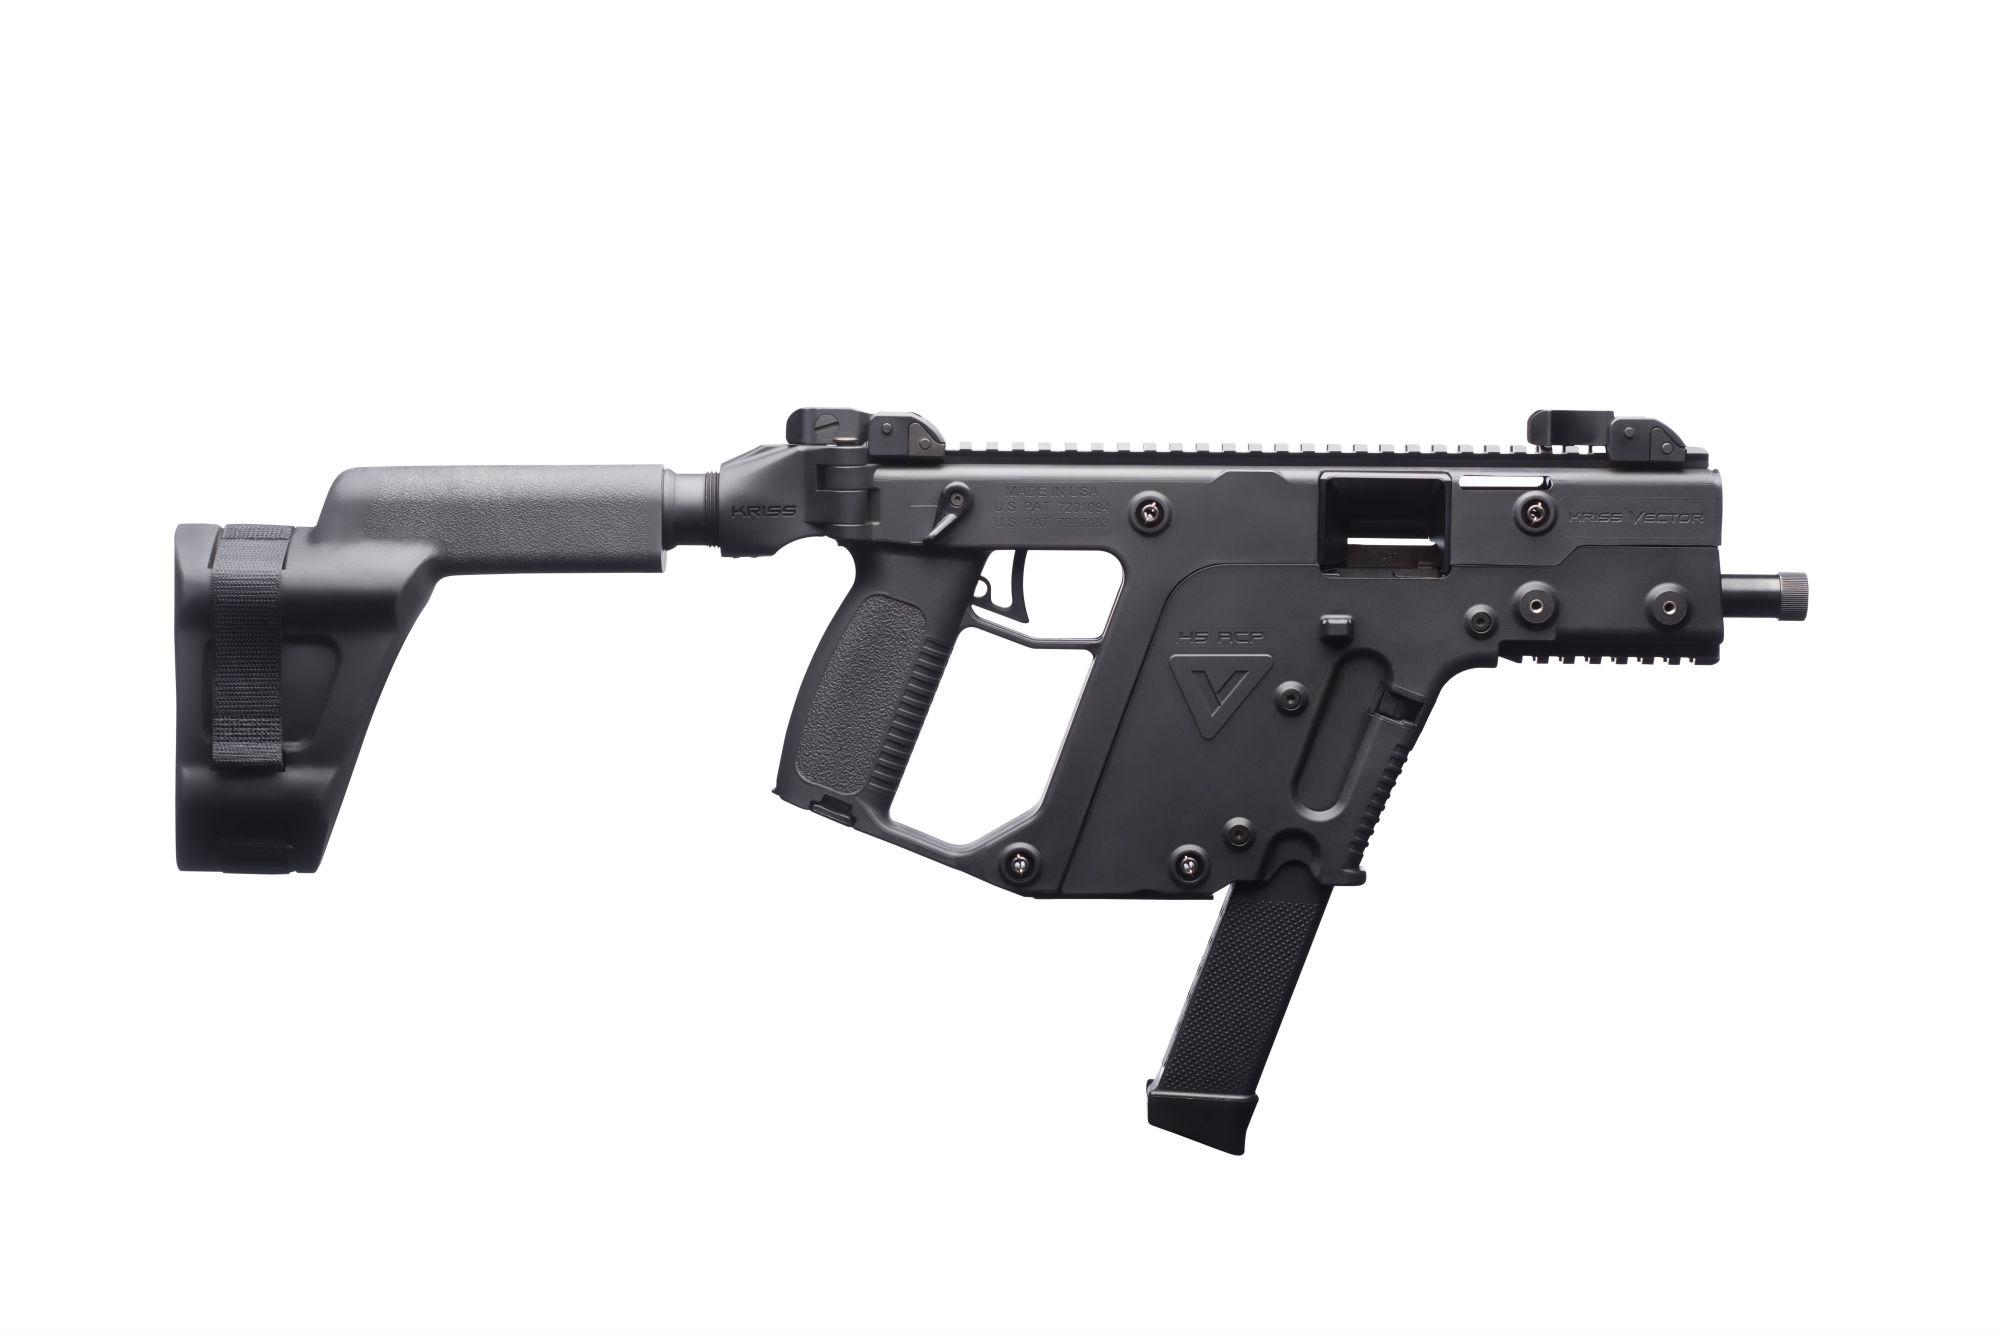 2000x1335 Kriss Vector Pistol Stabilizing Brace